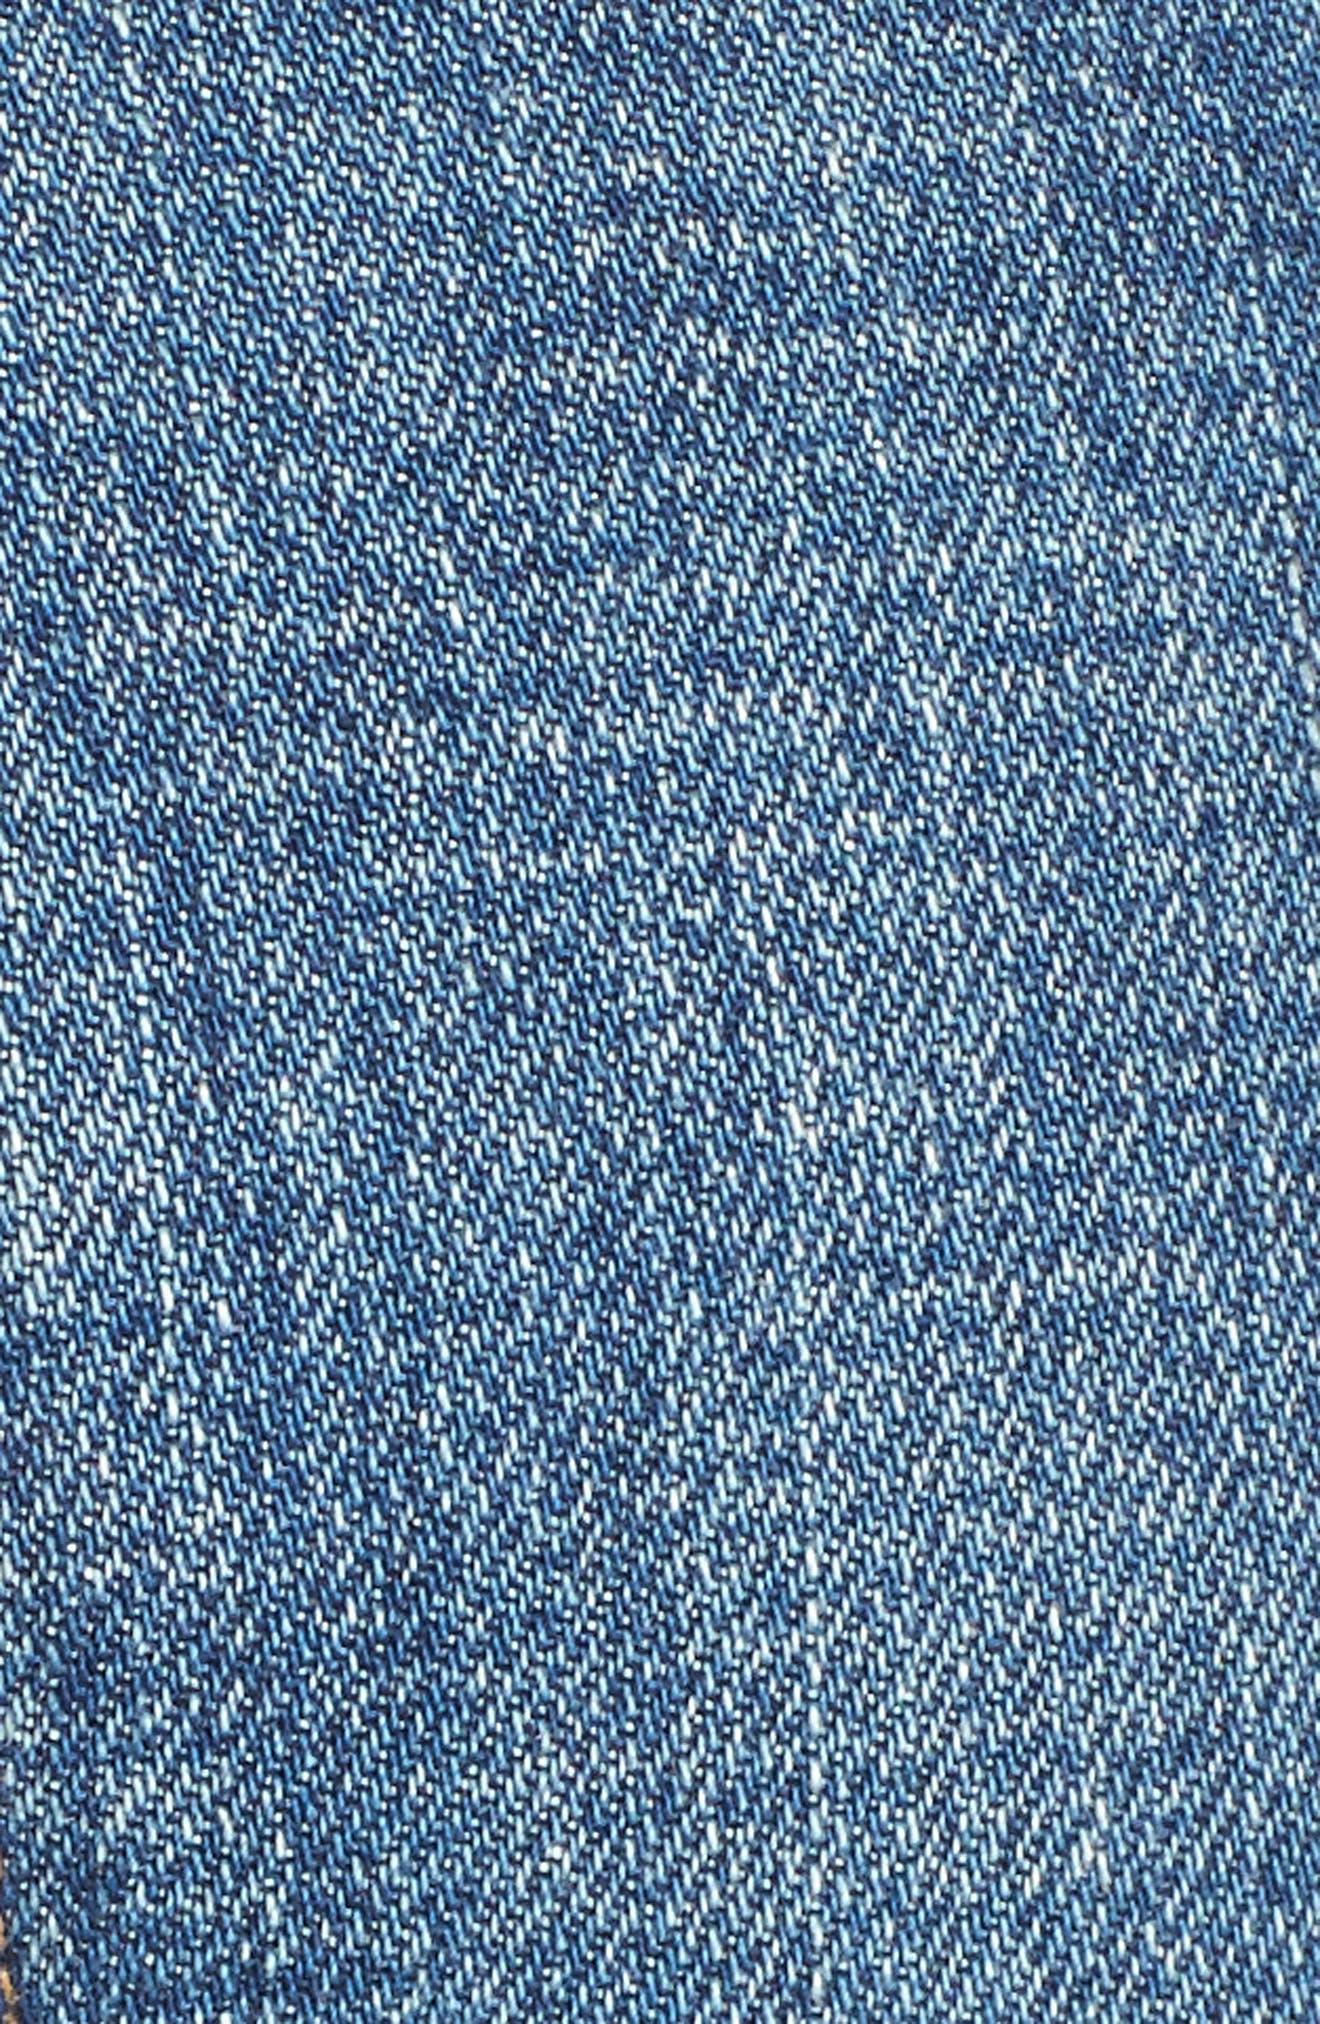 Alyx High Waist Cutoff Denim Shorts,                             Alternate thumbnail 5, color,                             Teaser